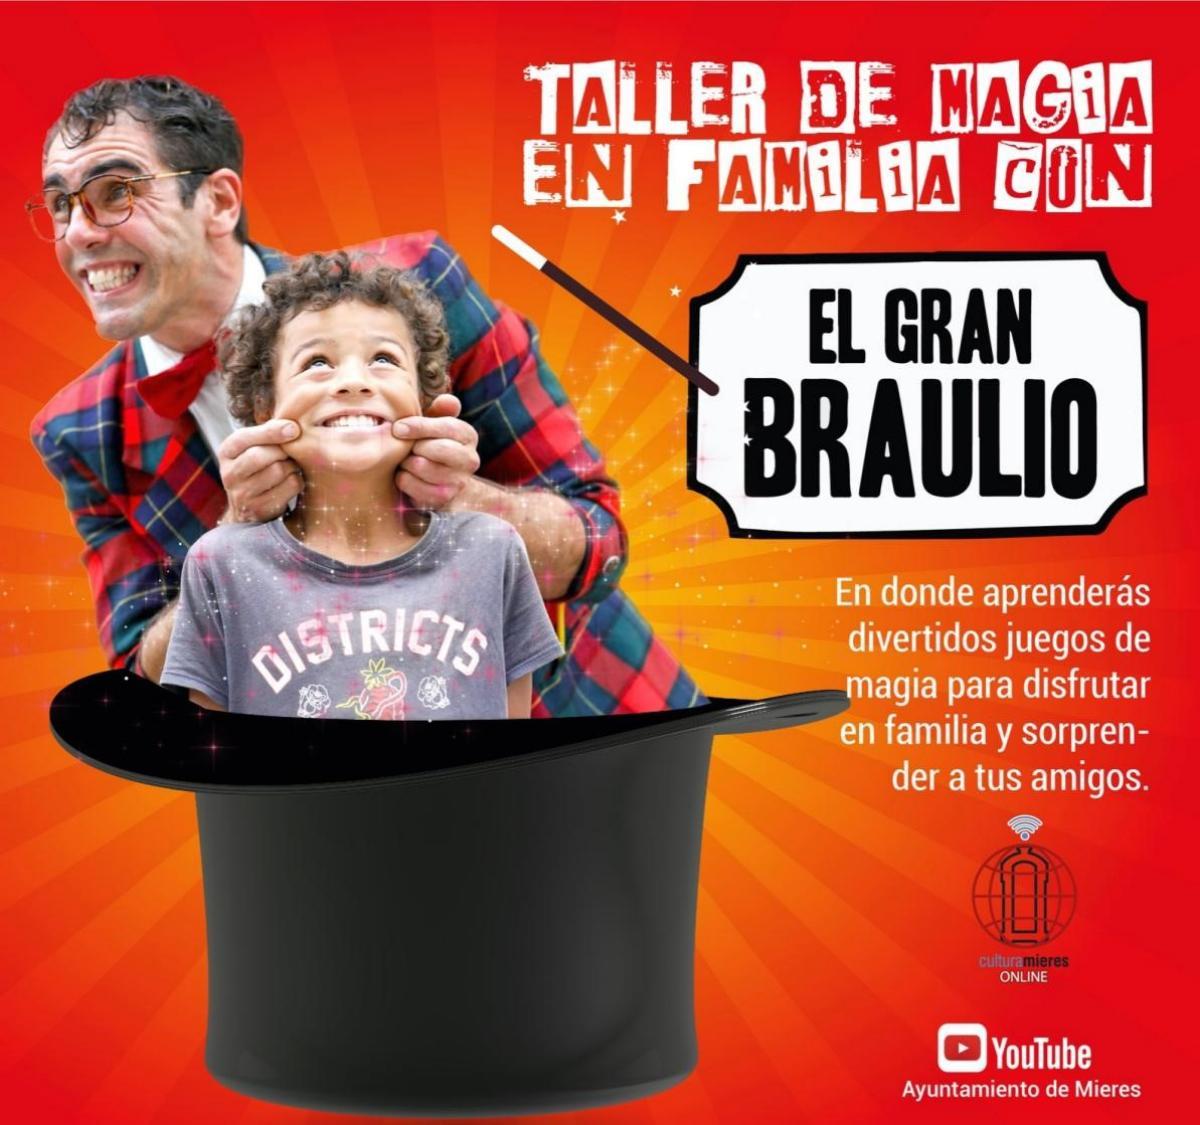 Taller Magia Mago Braulio 2 Mieres Web